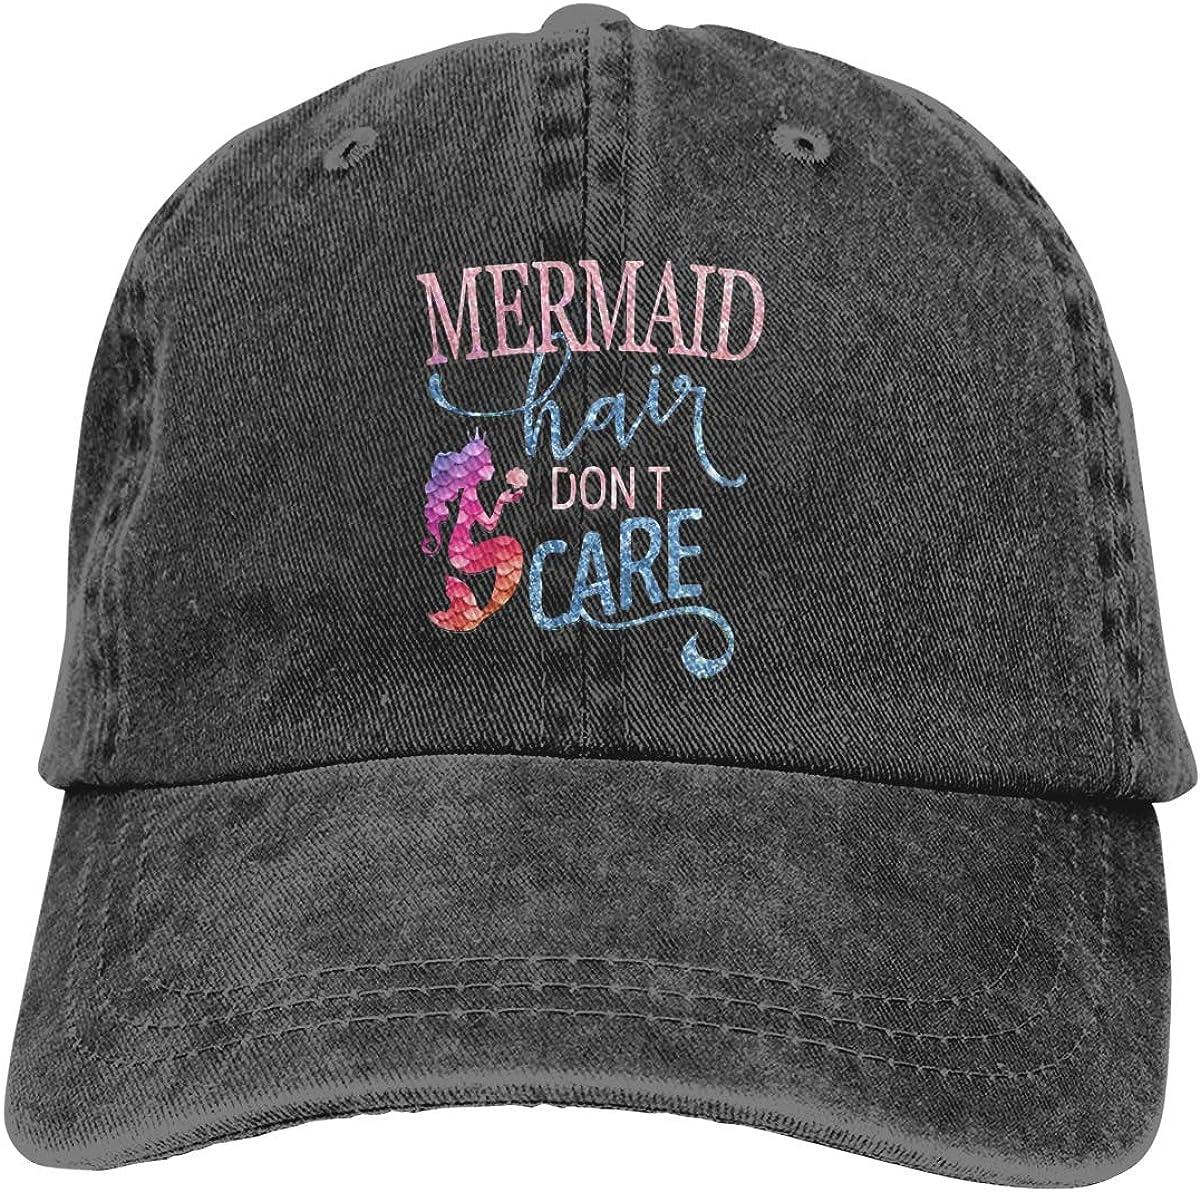 Mermaid Hair Don't Care Sun Cap Baseball Hat Dad-Hat Travel Visor Adjustable Fit for Ponytail Women Vintage Washed Black